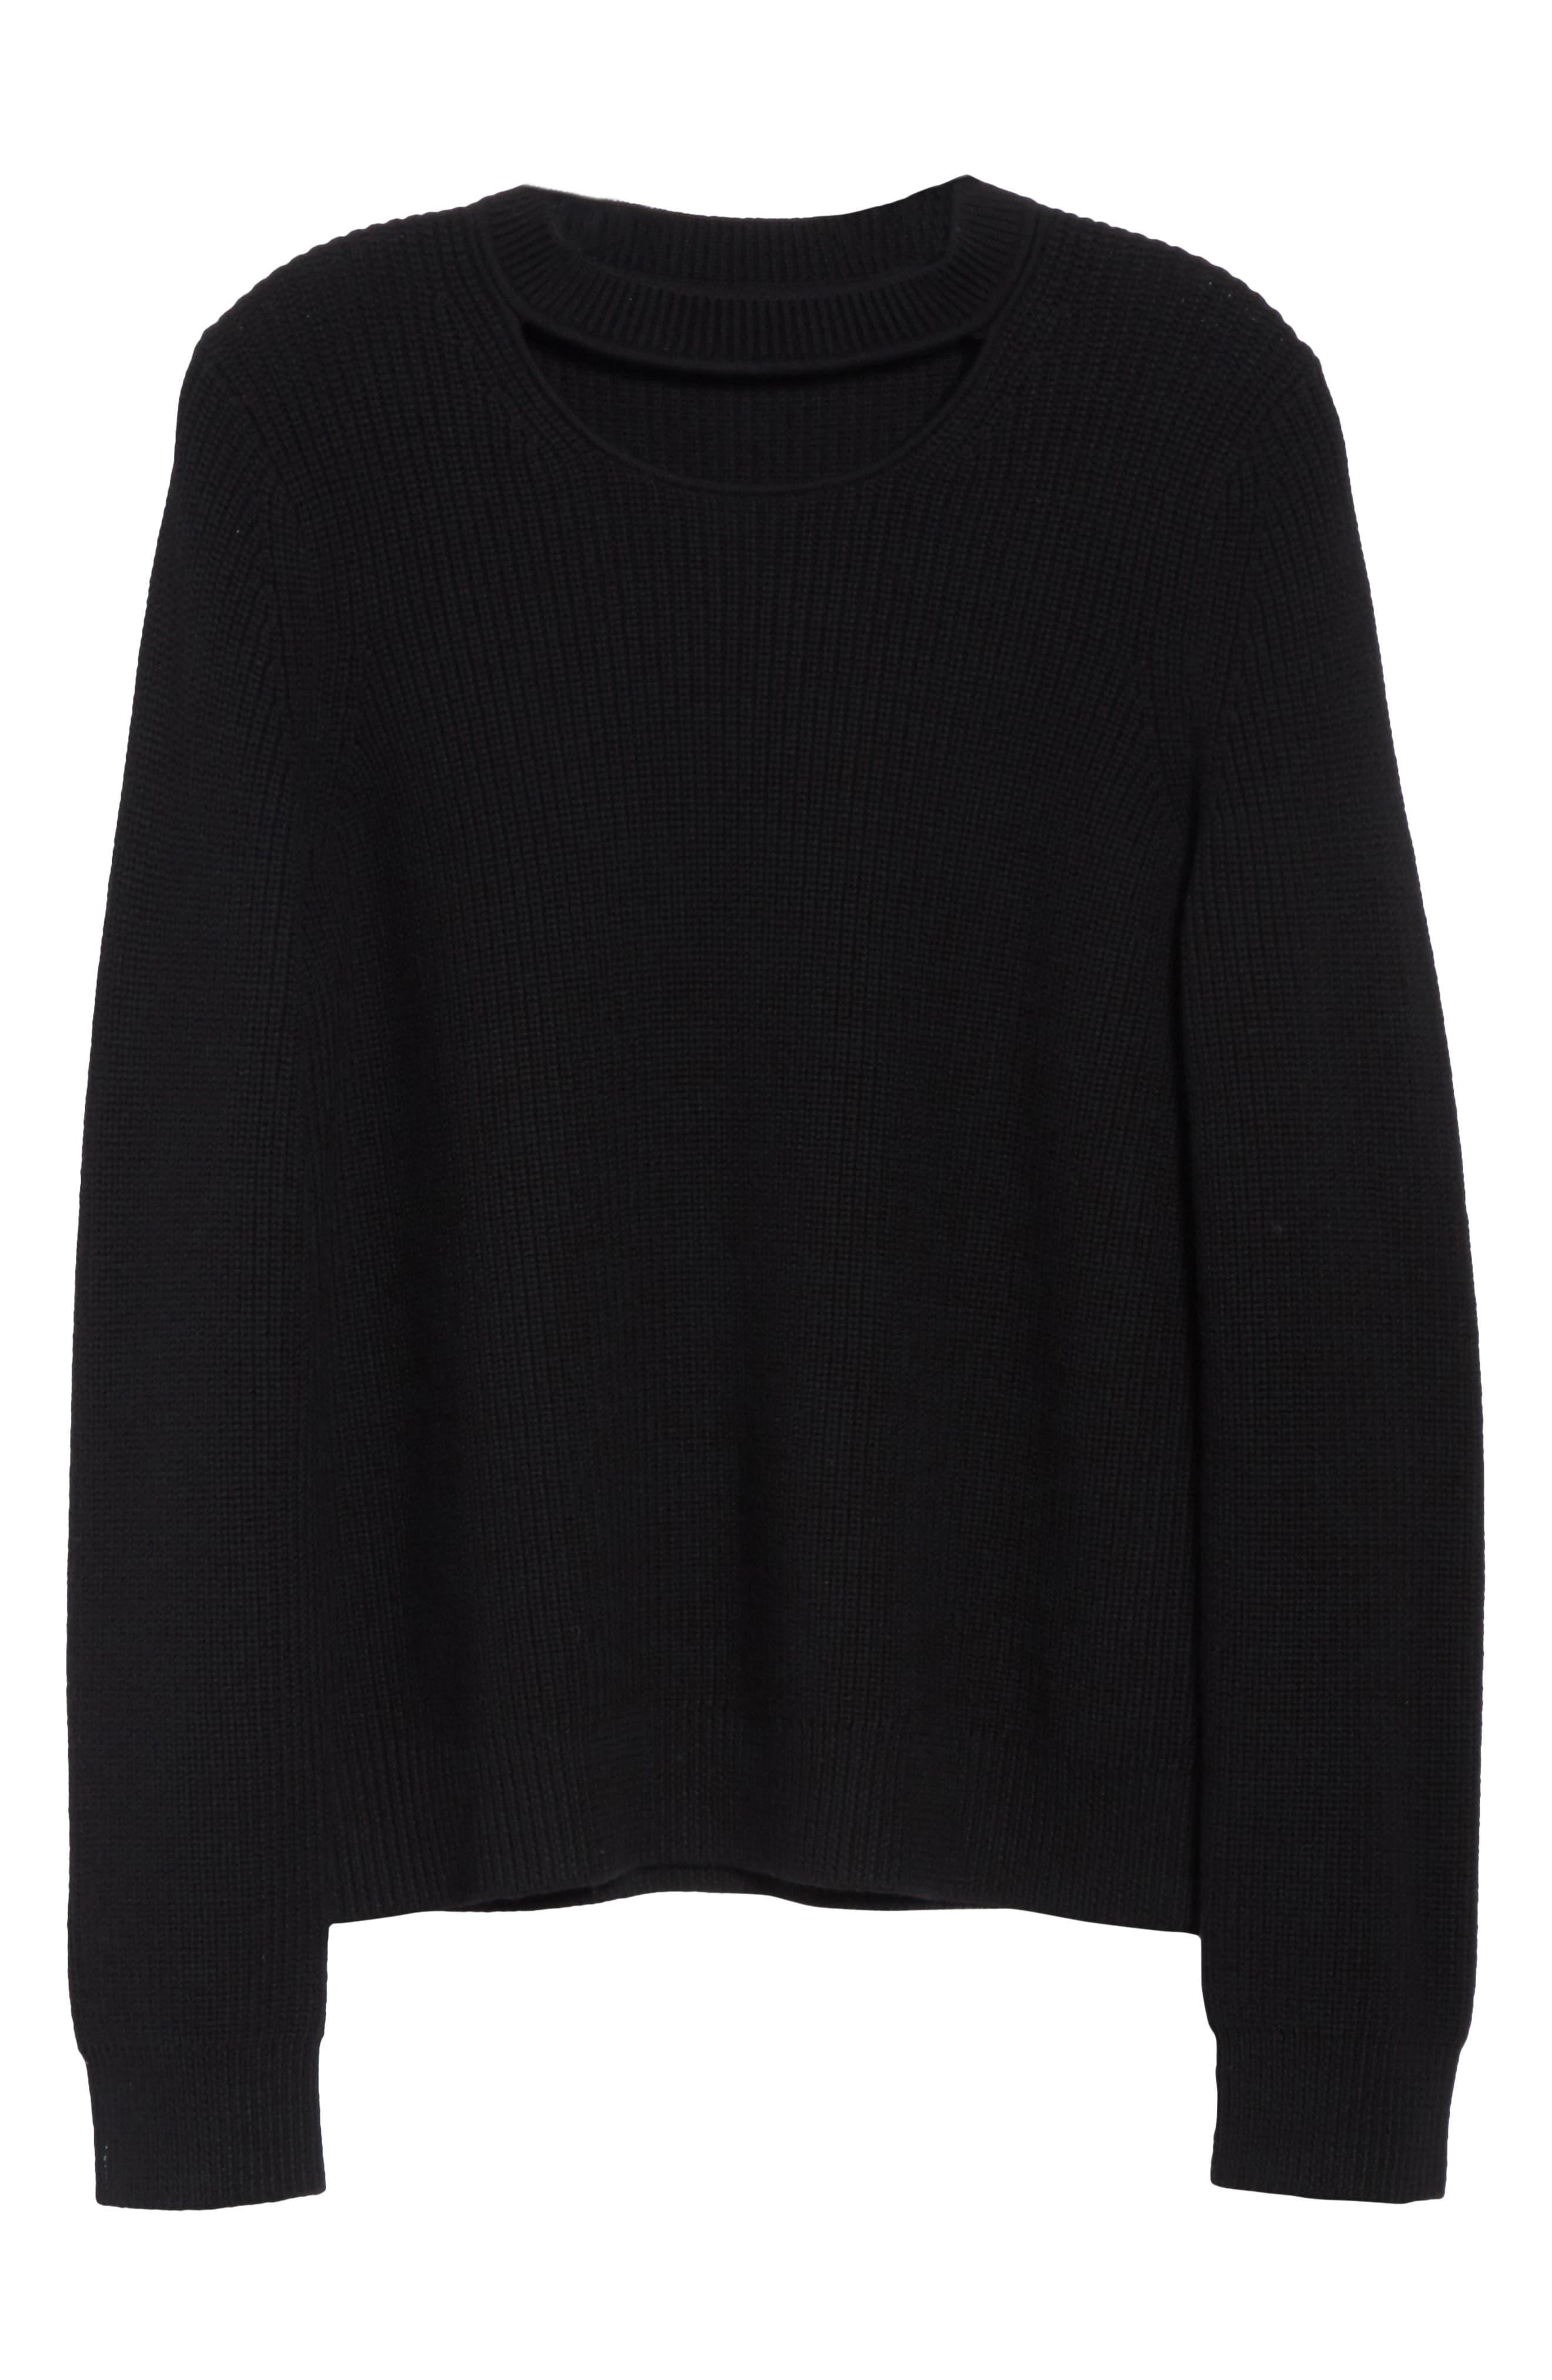 Tori Cutout Sweatshirt,                             Alternate thumbnail 6, color,                             001